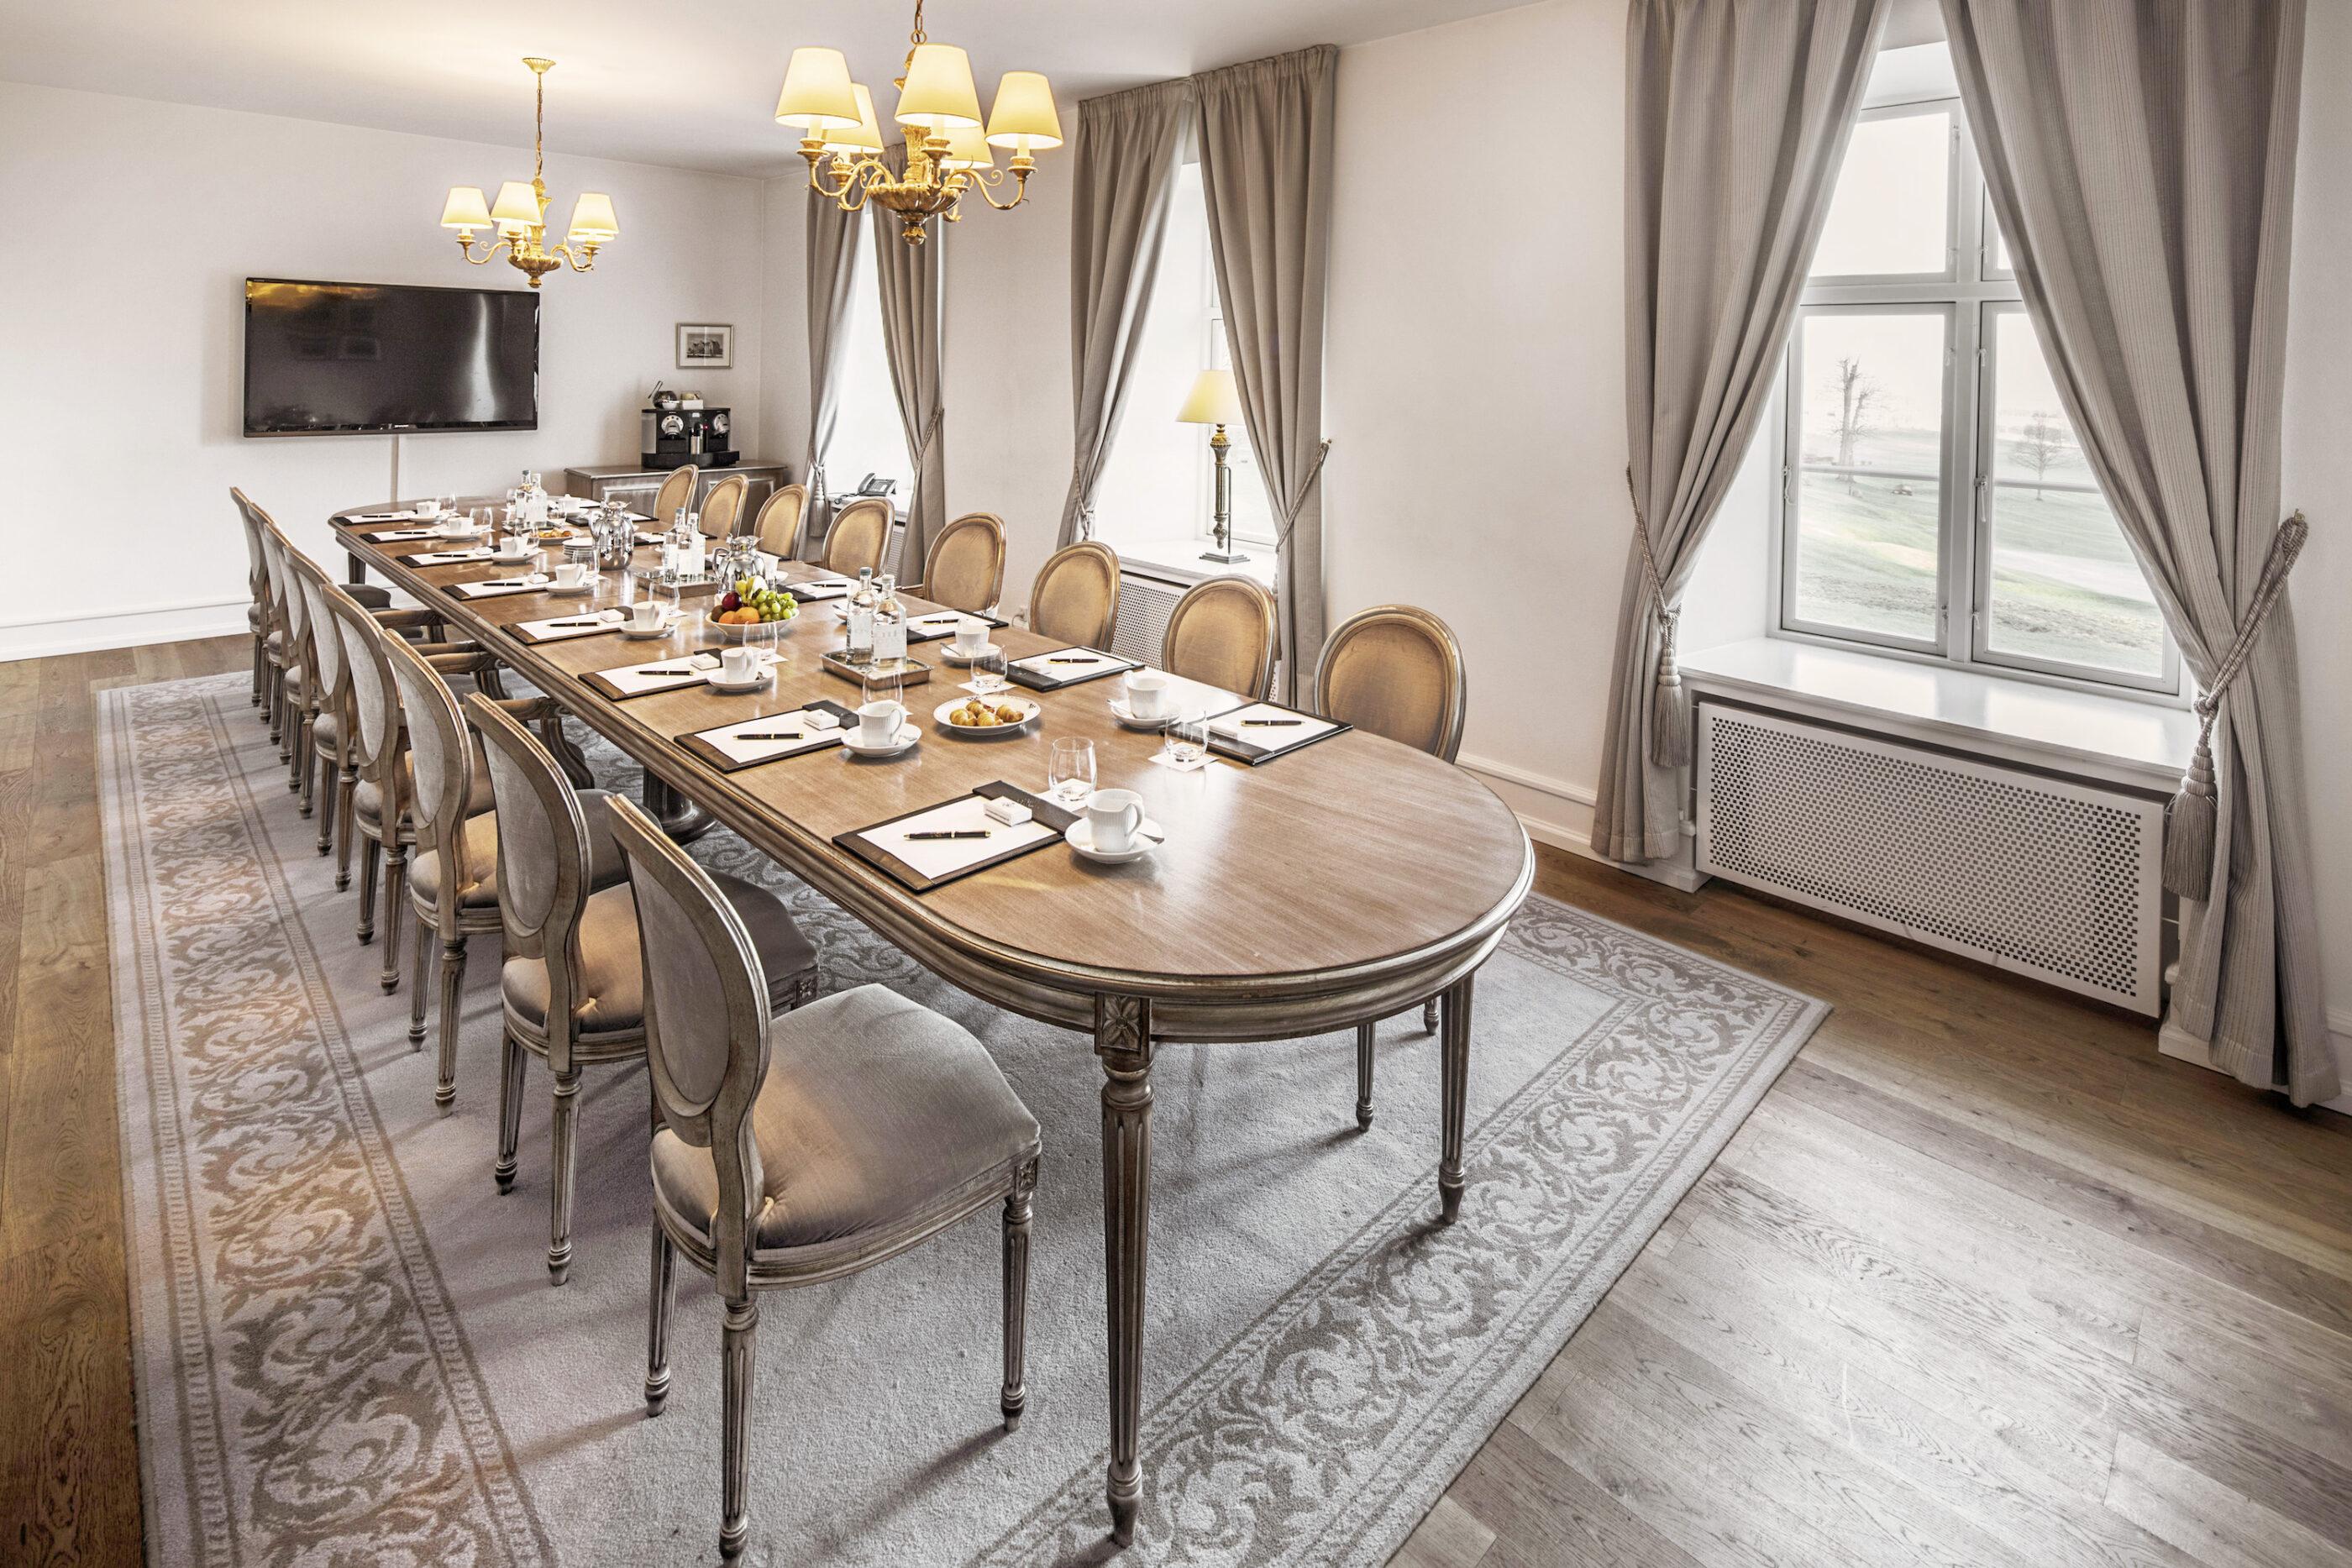 Mødelokale med et langt bord som har runde kanter og på bordet ligger pen og papir klar, med kaffe kopper ved hver stol